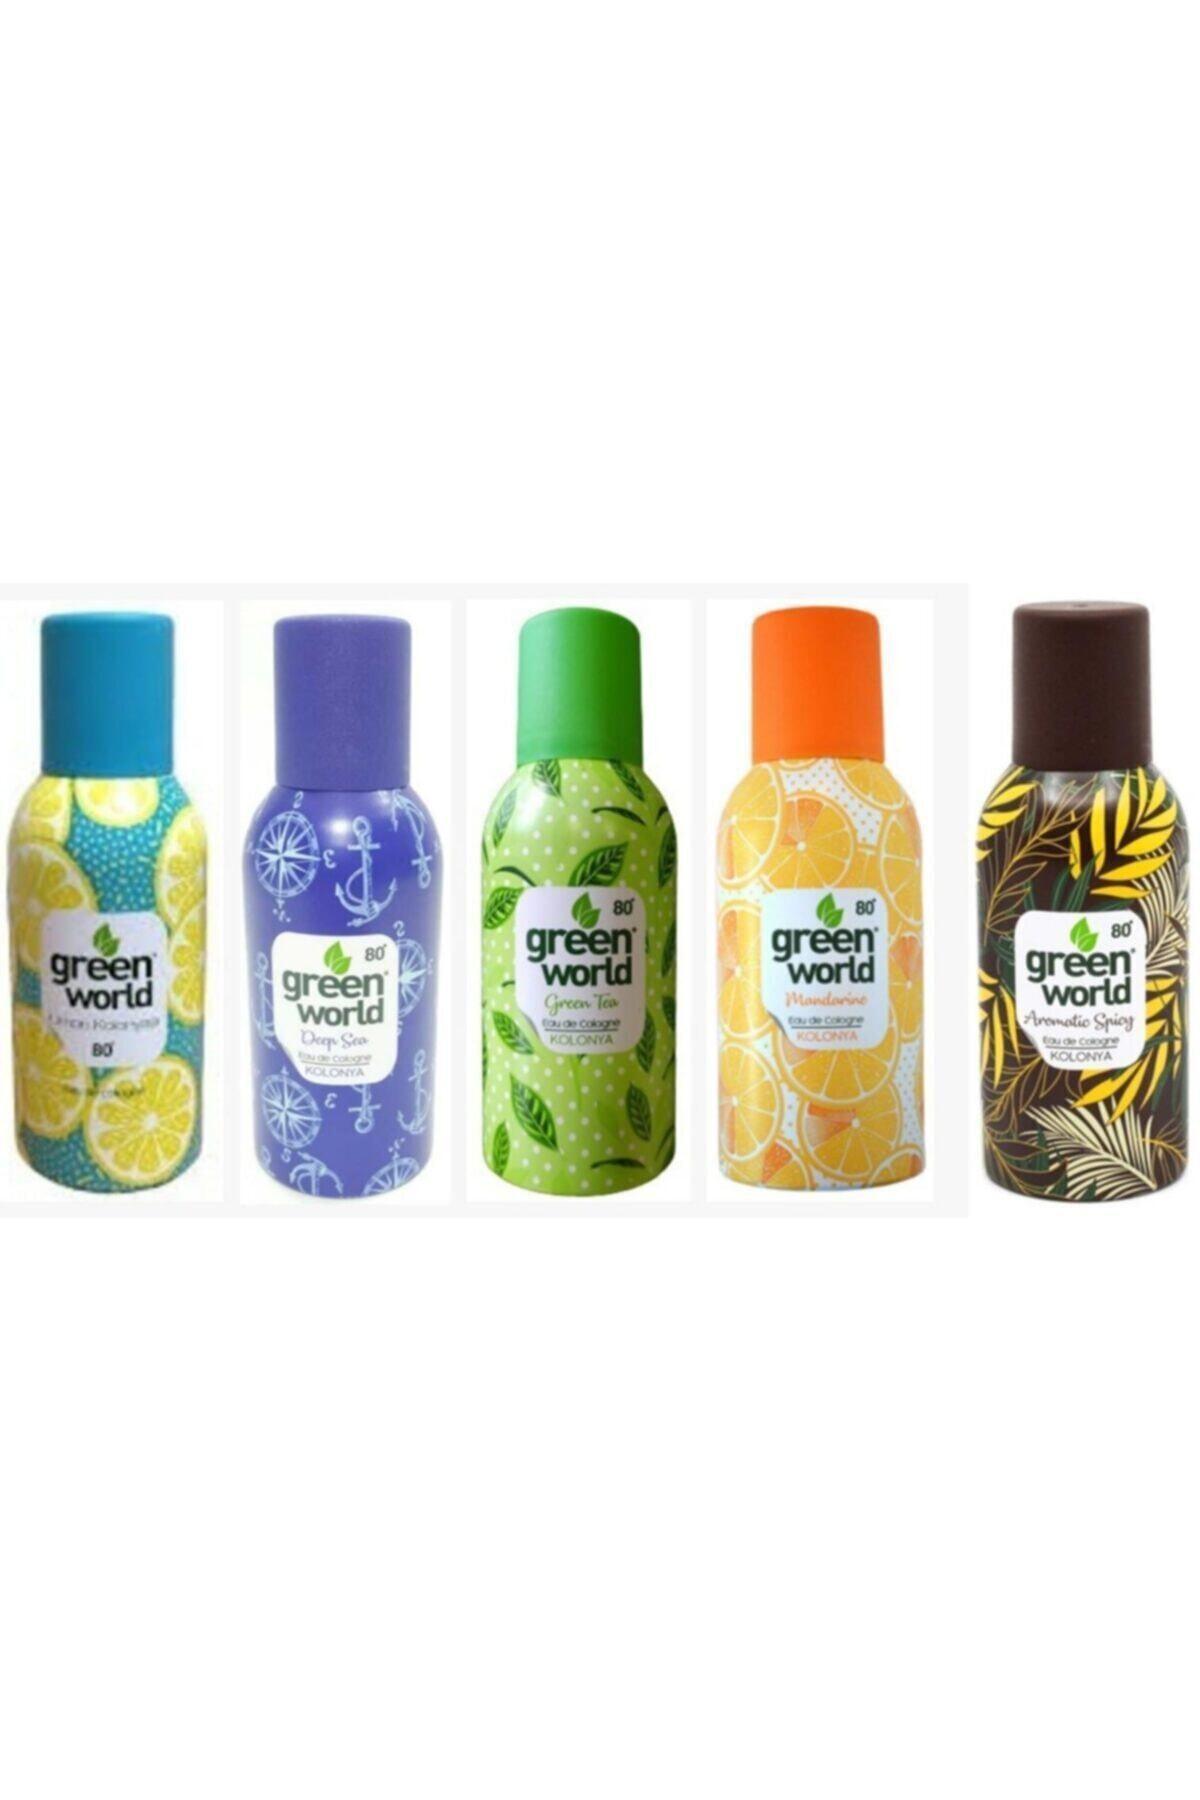 Green World 5li Kolonya Seti(Okyanus-mandalina-spicy-limon-greentea) 1